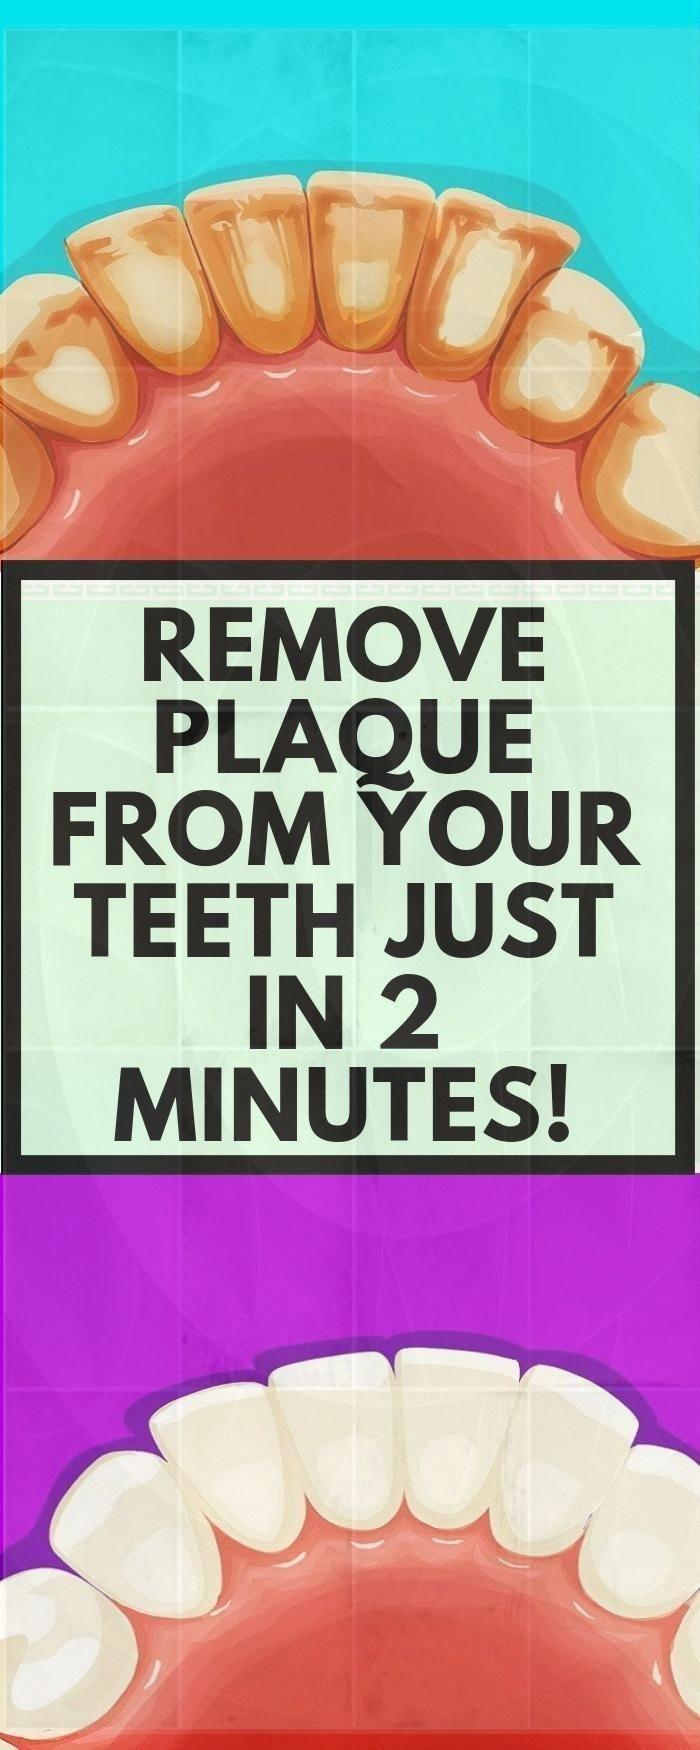 #bea #fitness #MINUTES #mouthwash #Page #Plaque #removes #Teeth This Mouthwash Removes Plaque From T...